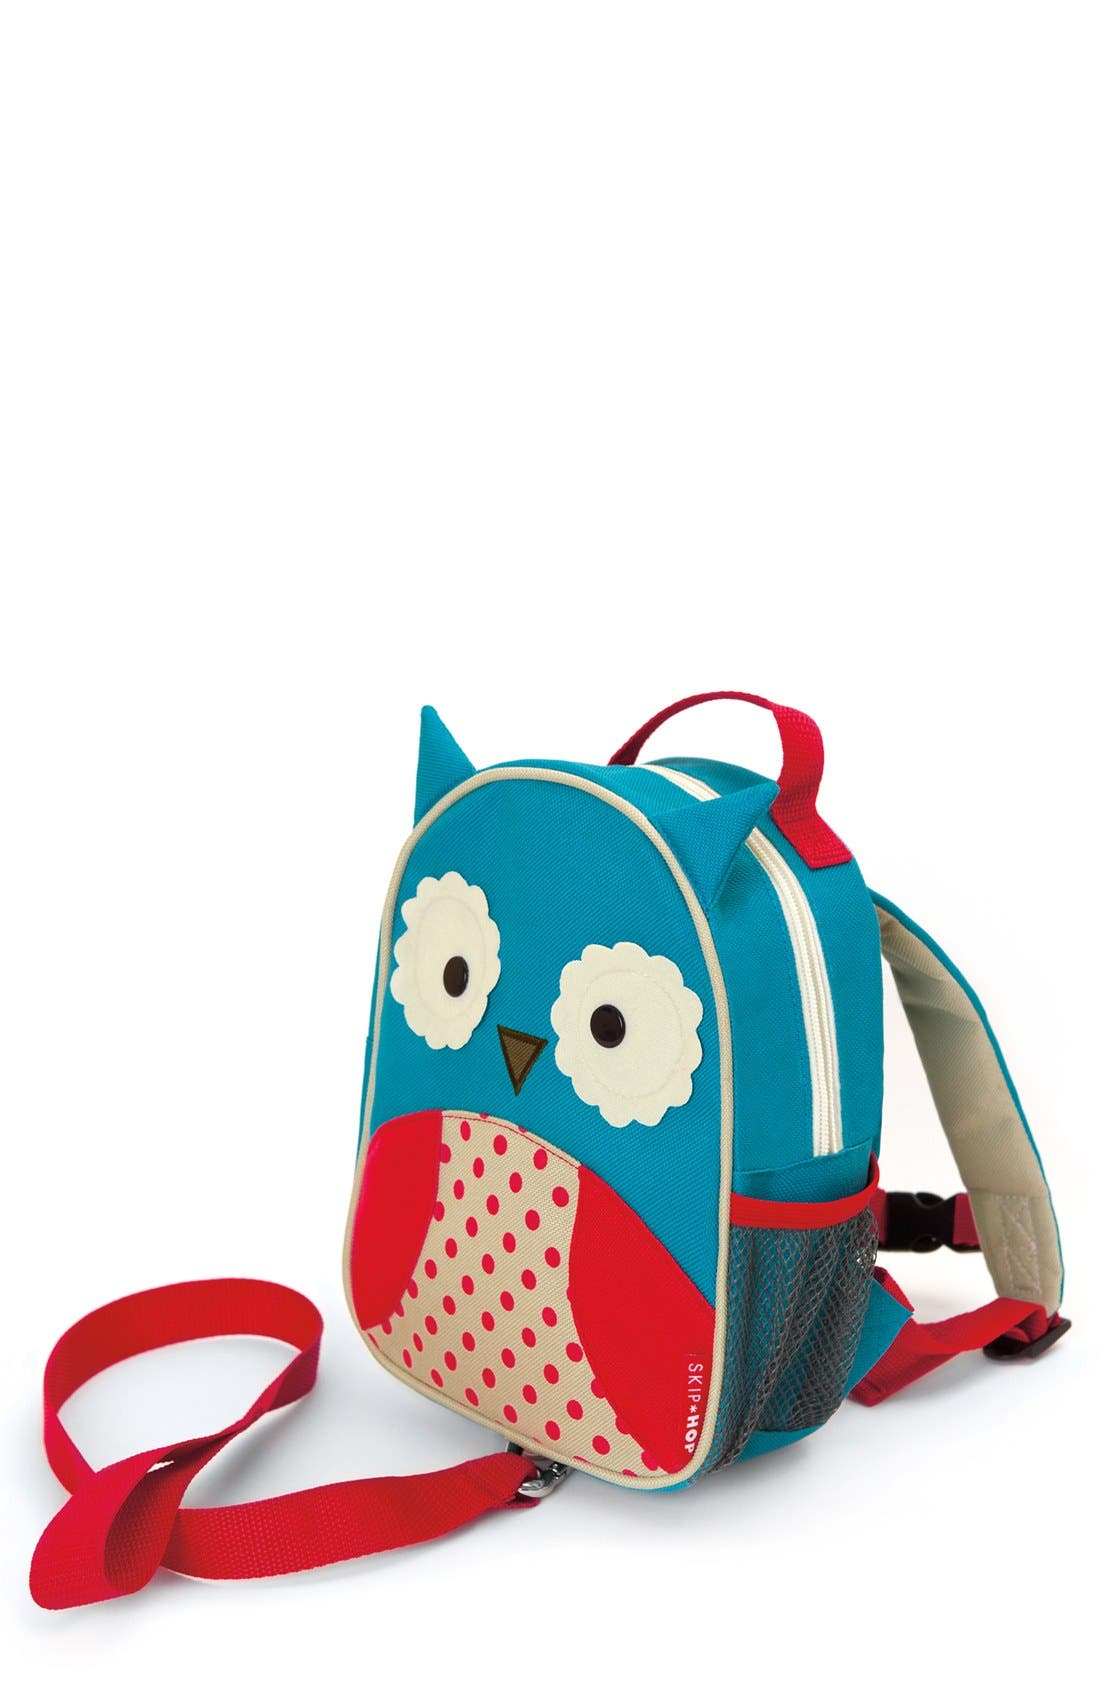 Main Image - Skip Hop 'Zoo' Safety Harness Backpack (Kids)